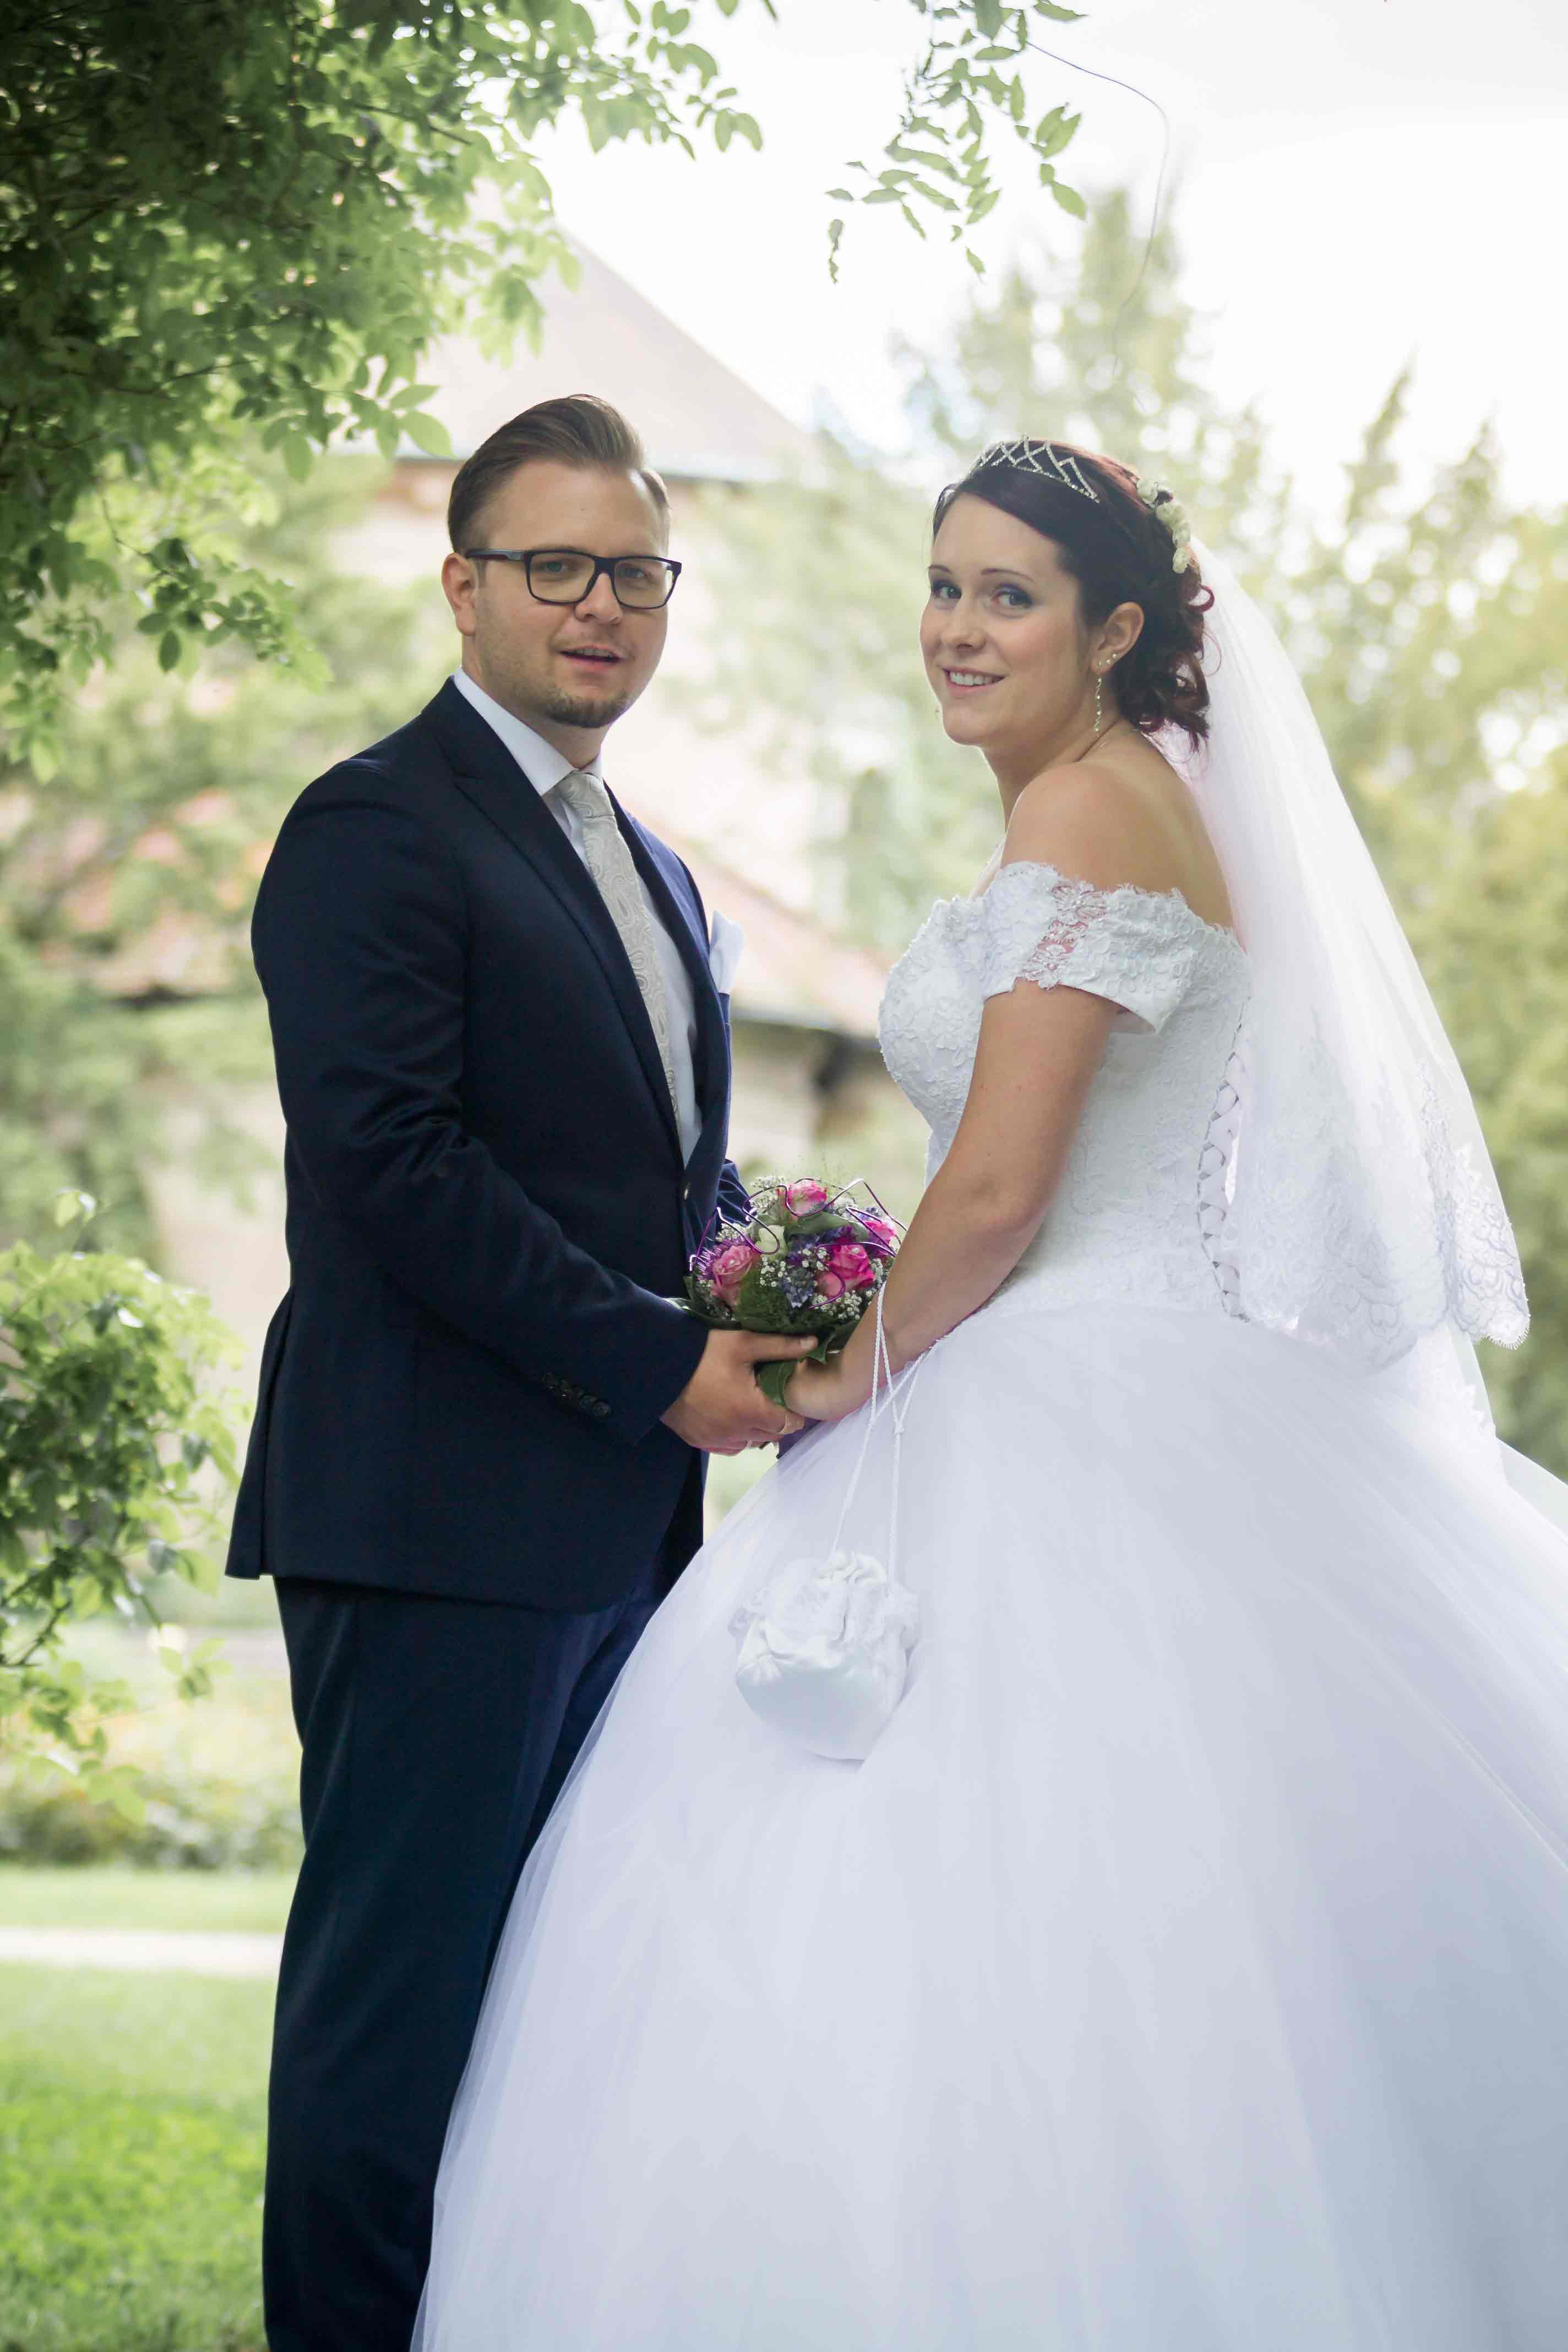 Hochzeitsfotografie-2271w